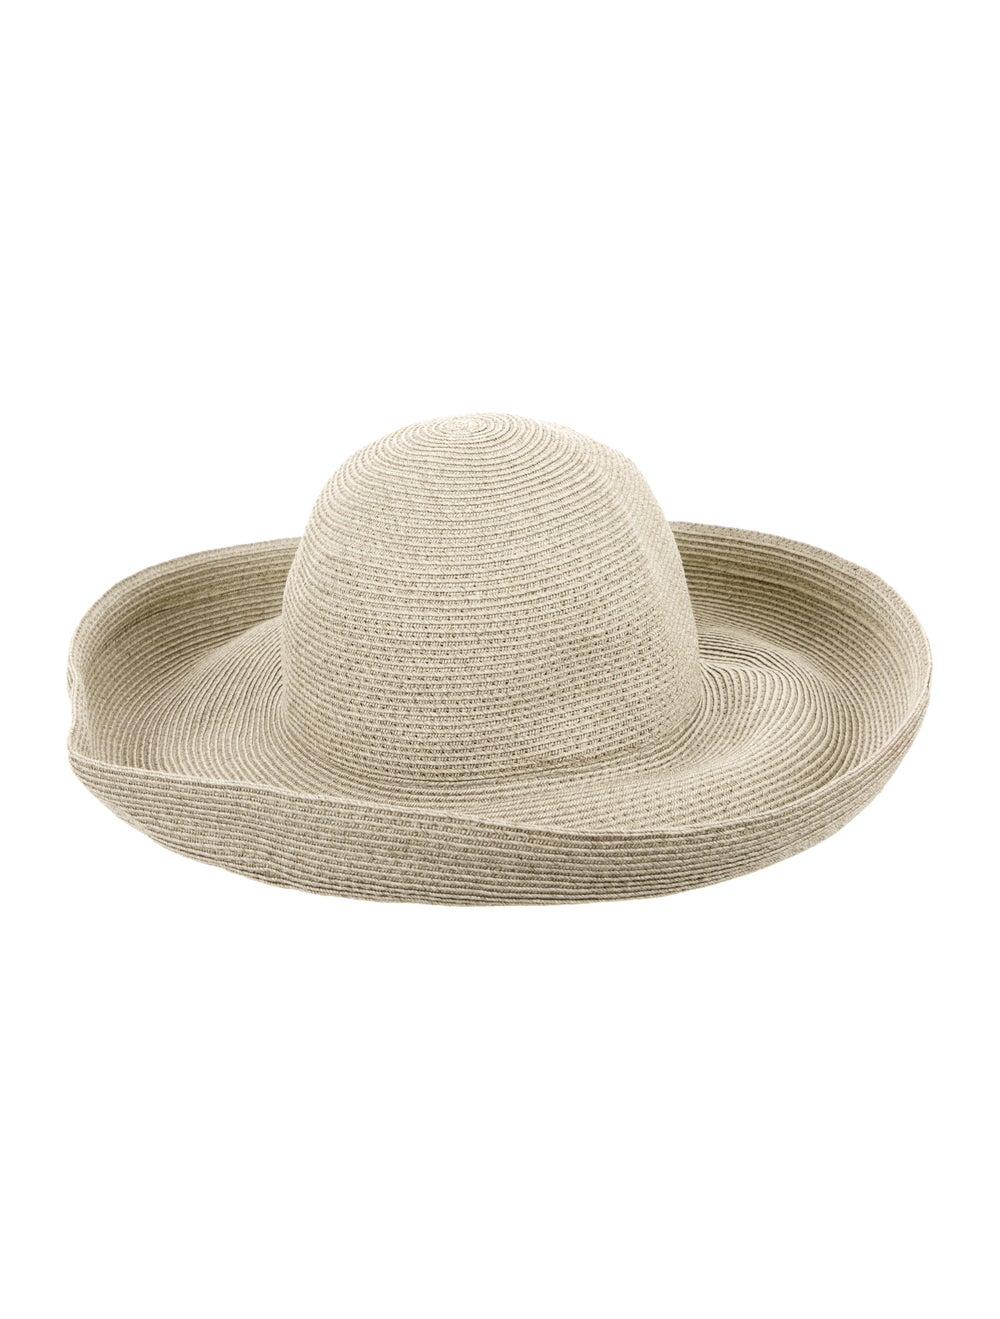 Eric Javits Wide-Brim Straw Hat green - image 2